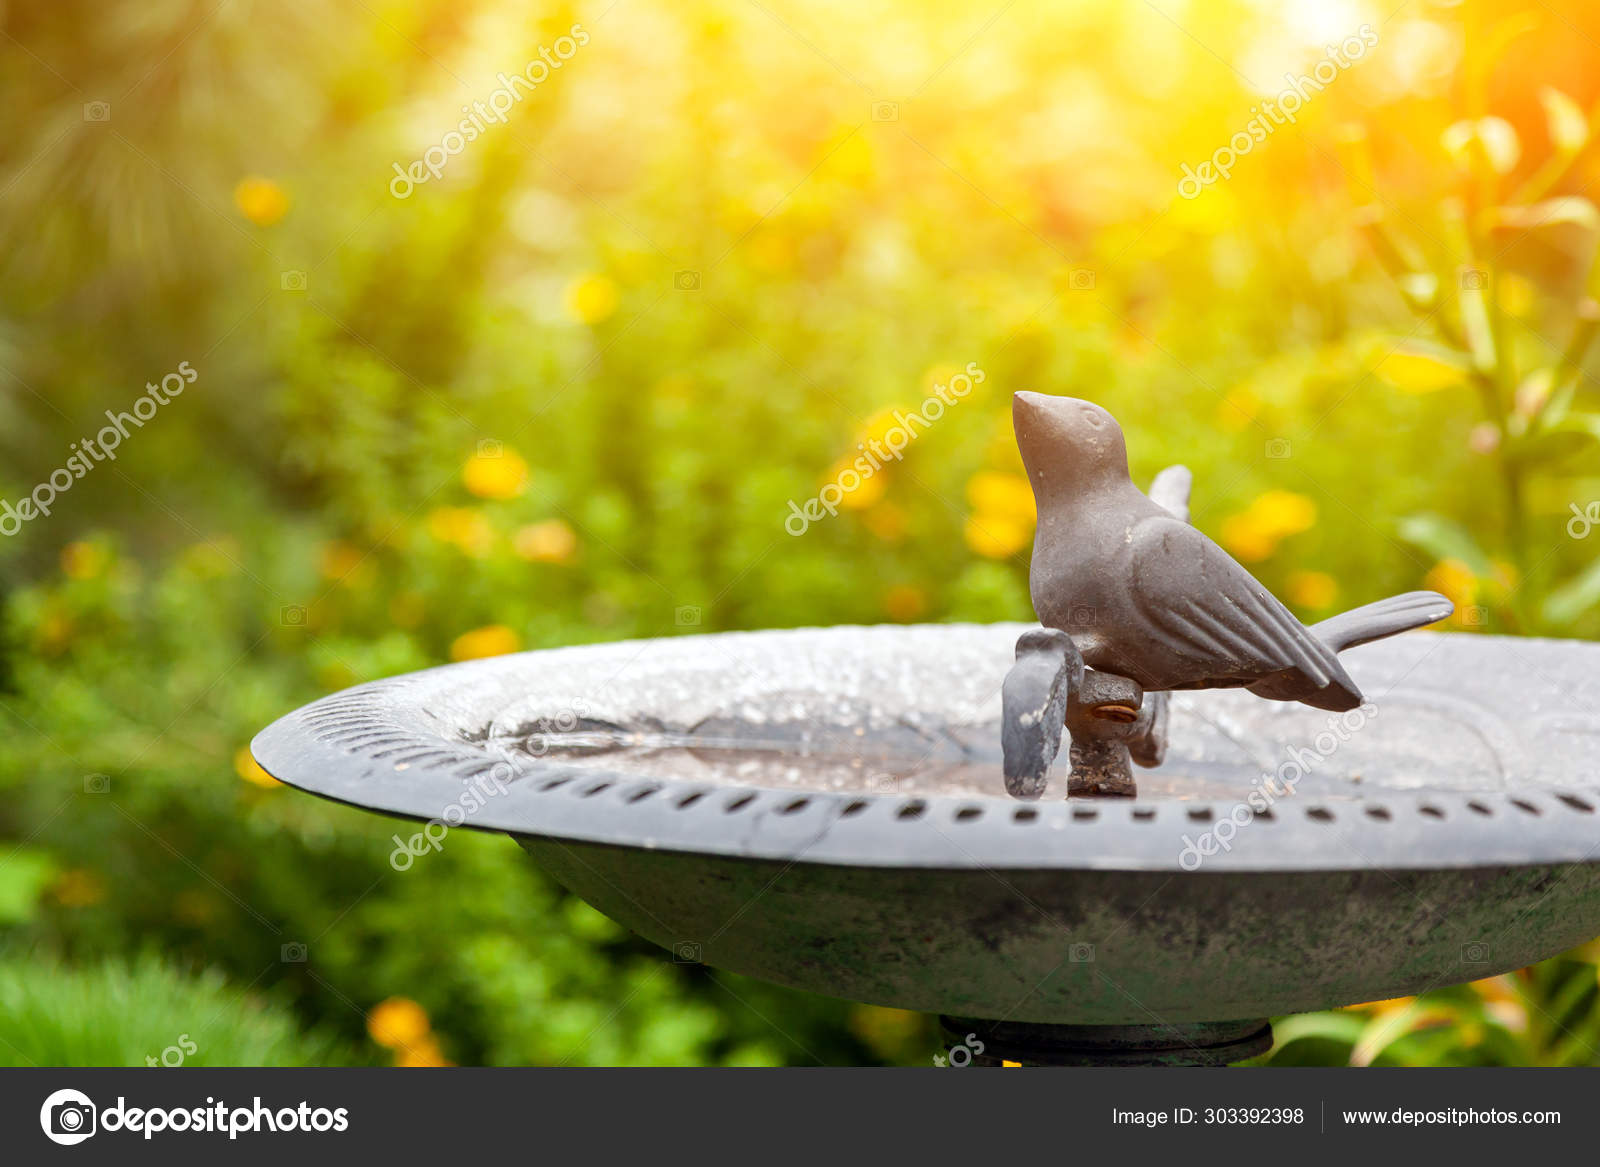 Decorative Decoration Garden Ceramic Pot Statue Small Metal Bird Drinking Stock Photo Image By Everyonensk 303392398